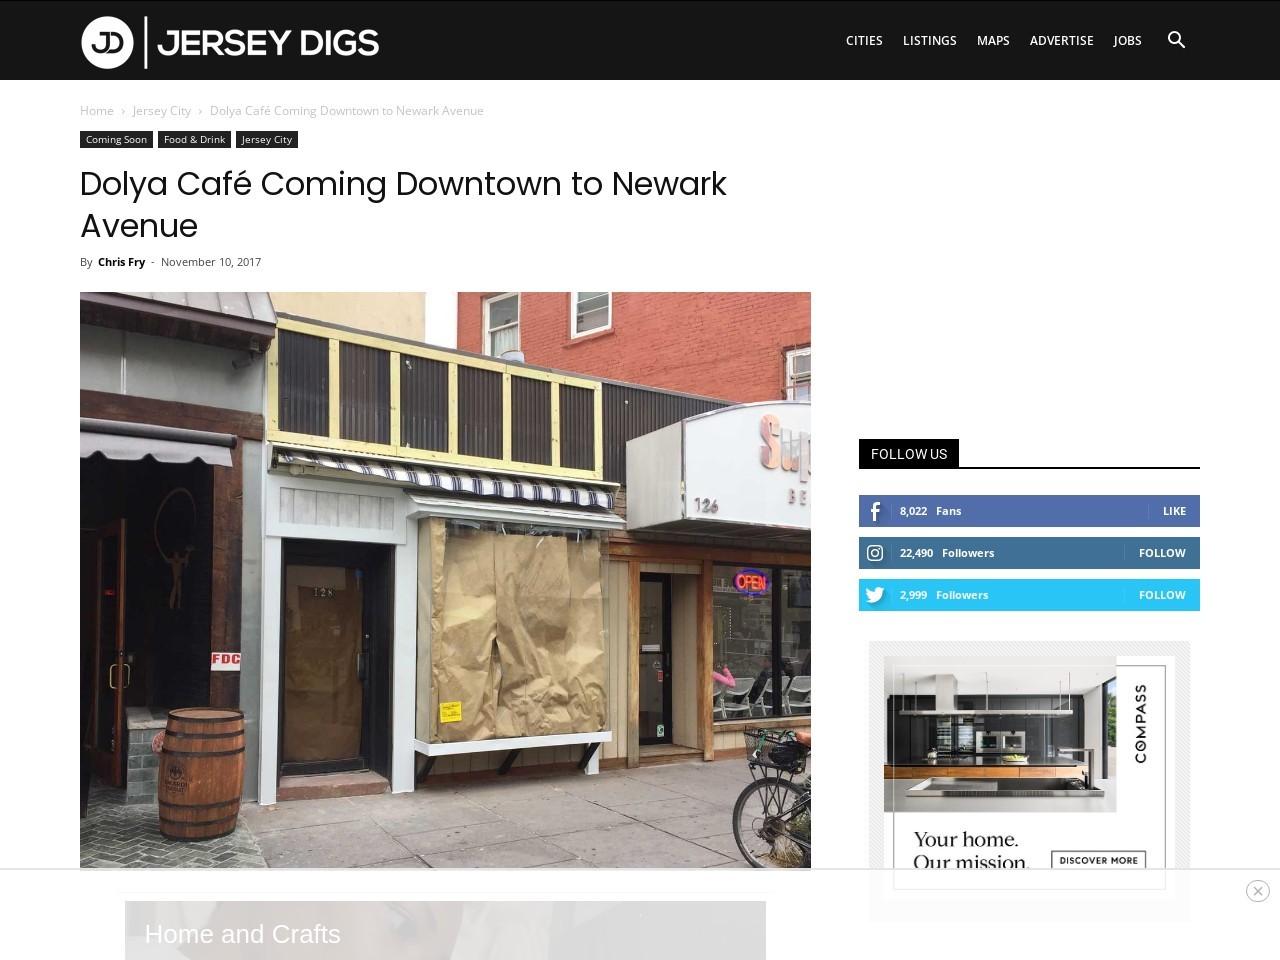 Dolya Café Coming Downtown to Newark Avenue